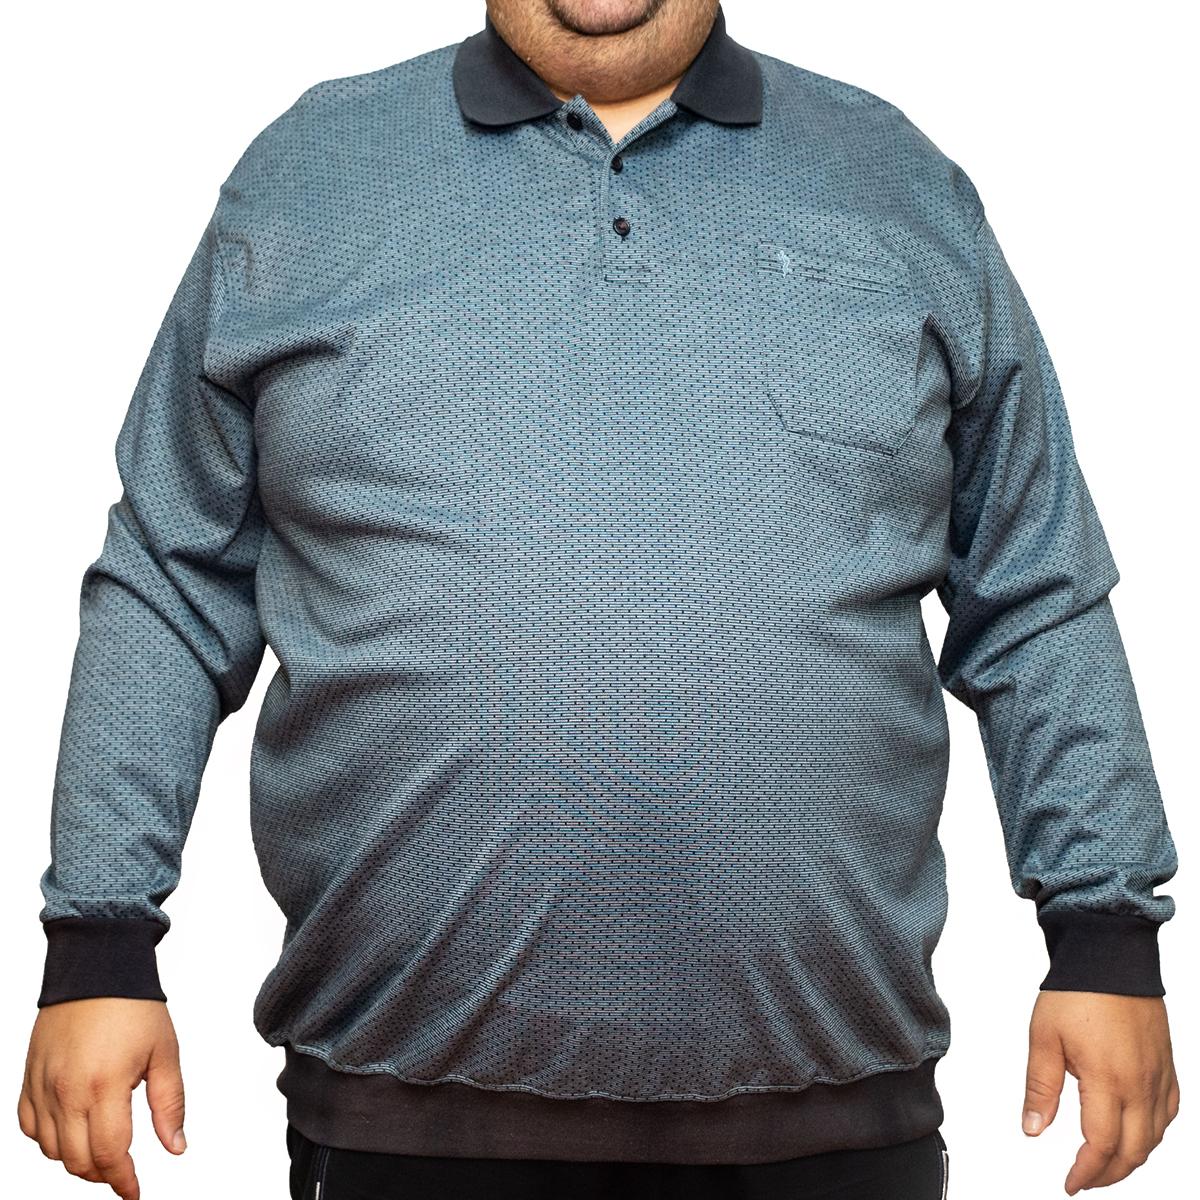 Bluza subtire gri cu guler , Marime 5XL - egato.ro